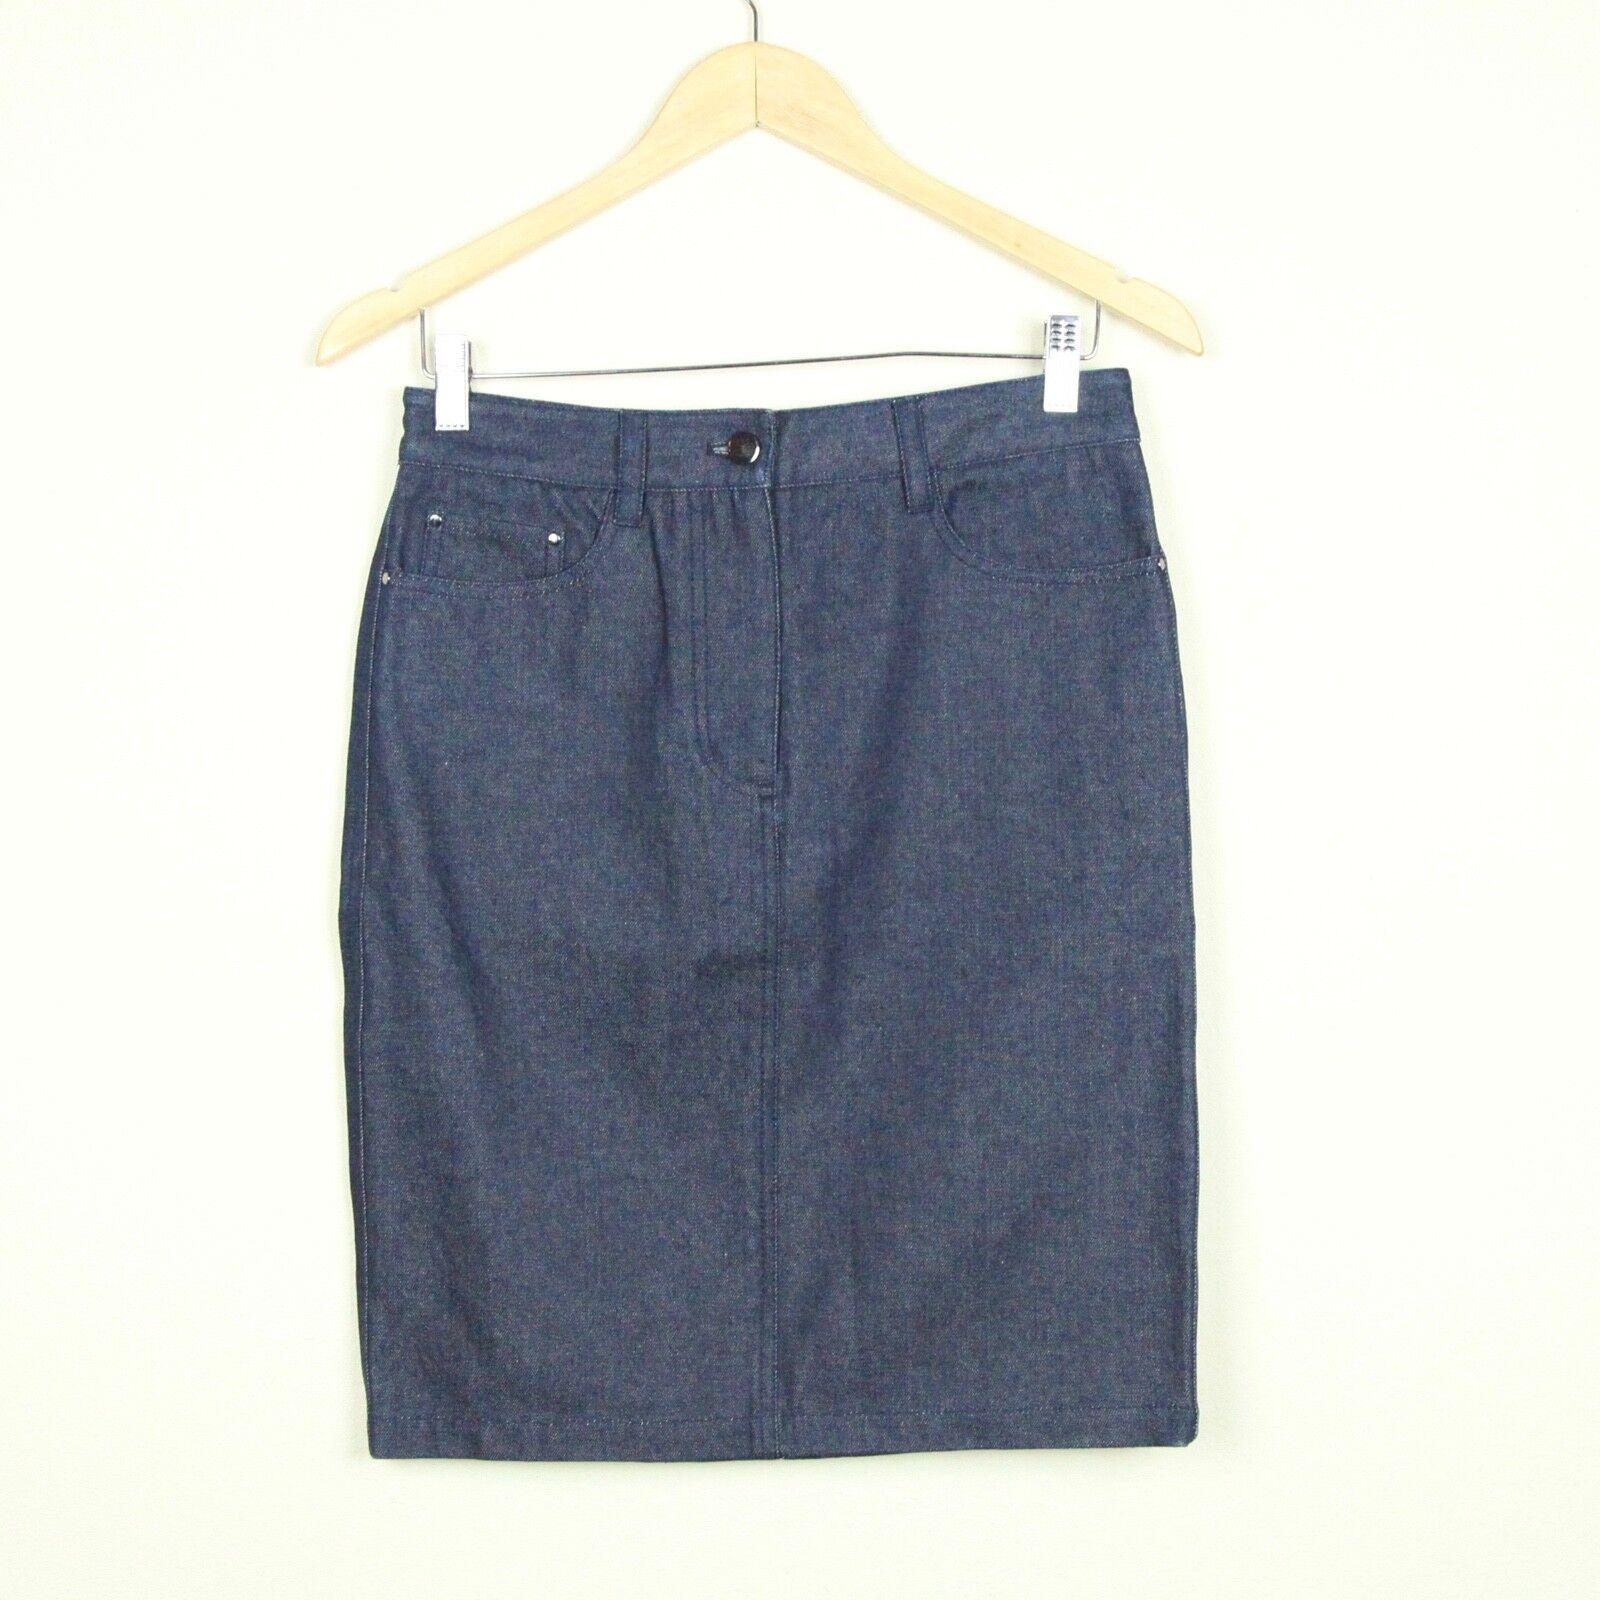 3.1 Philip Lim Dark Wash Denim Pencil Skirt 4 Jean Straight